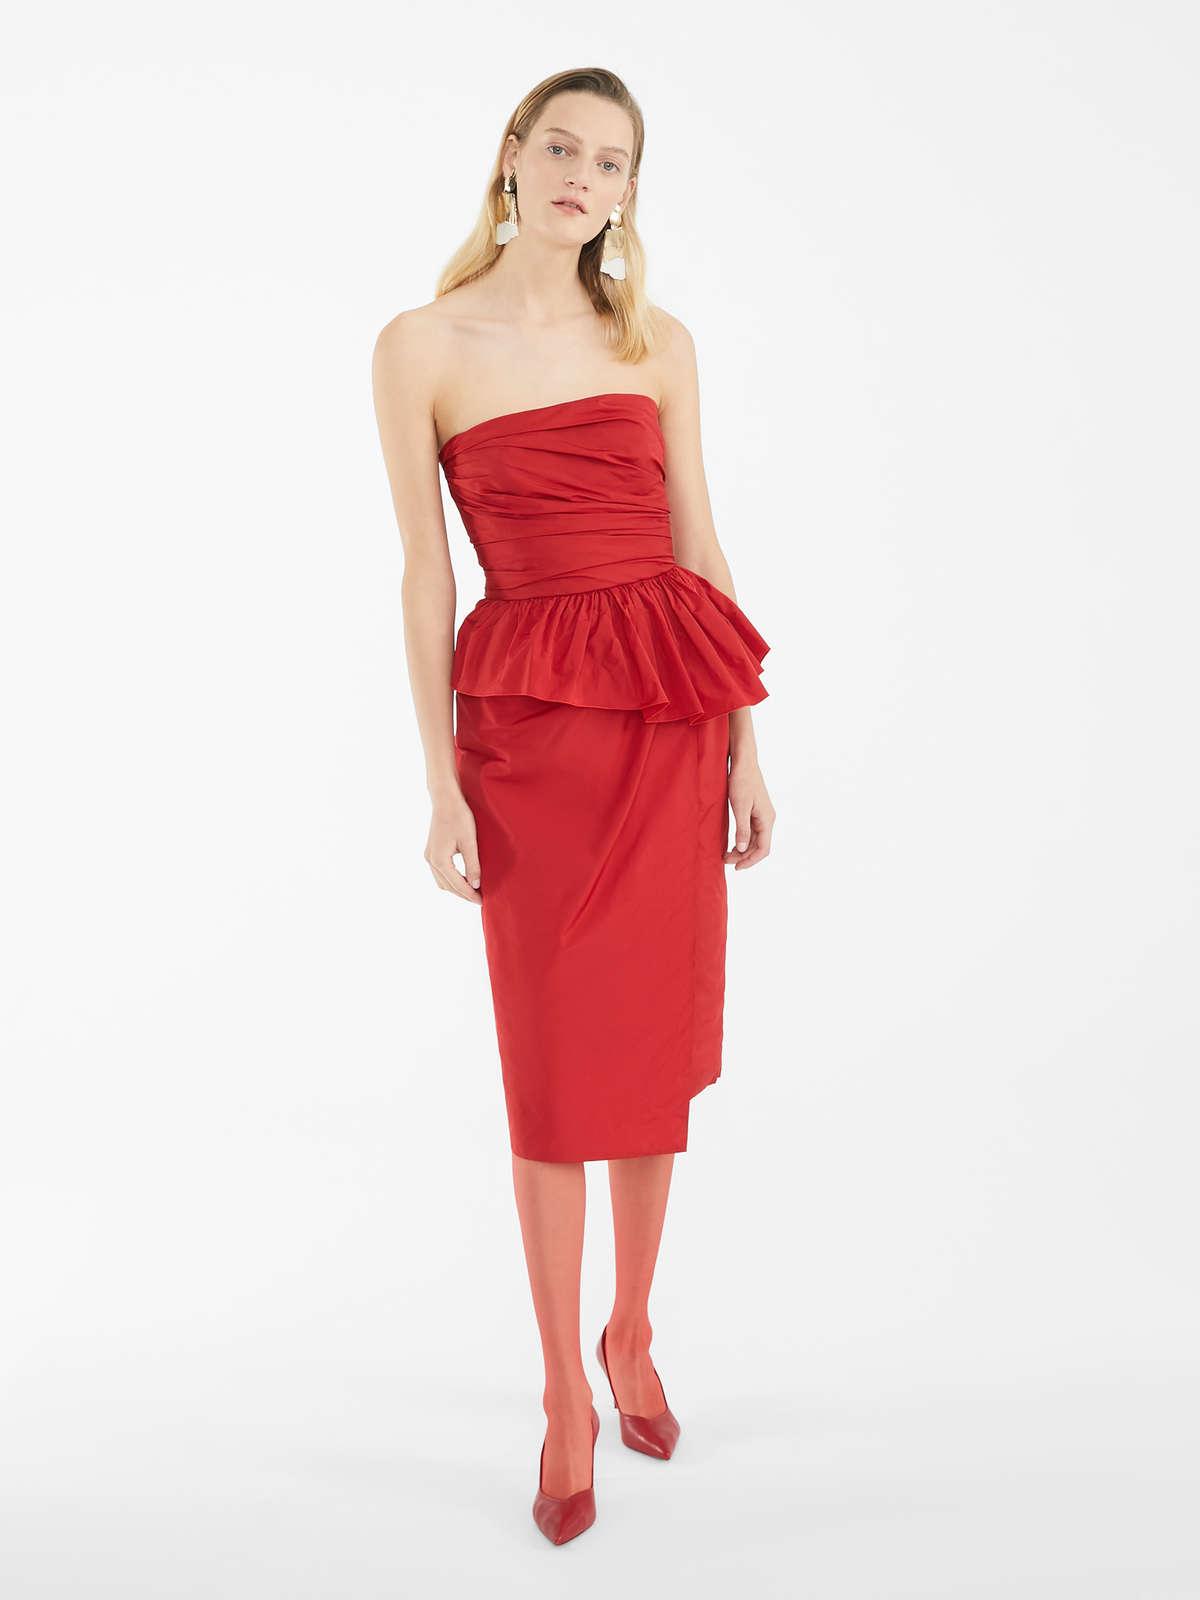 Taffeta Dress - Max Mara